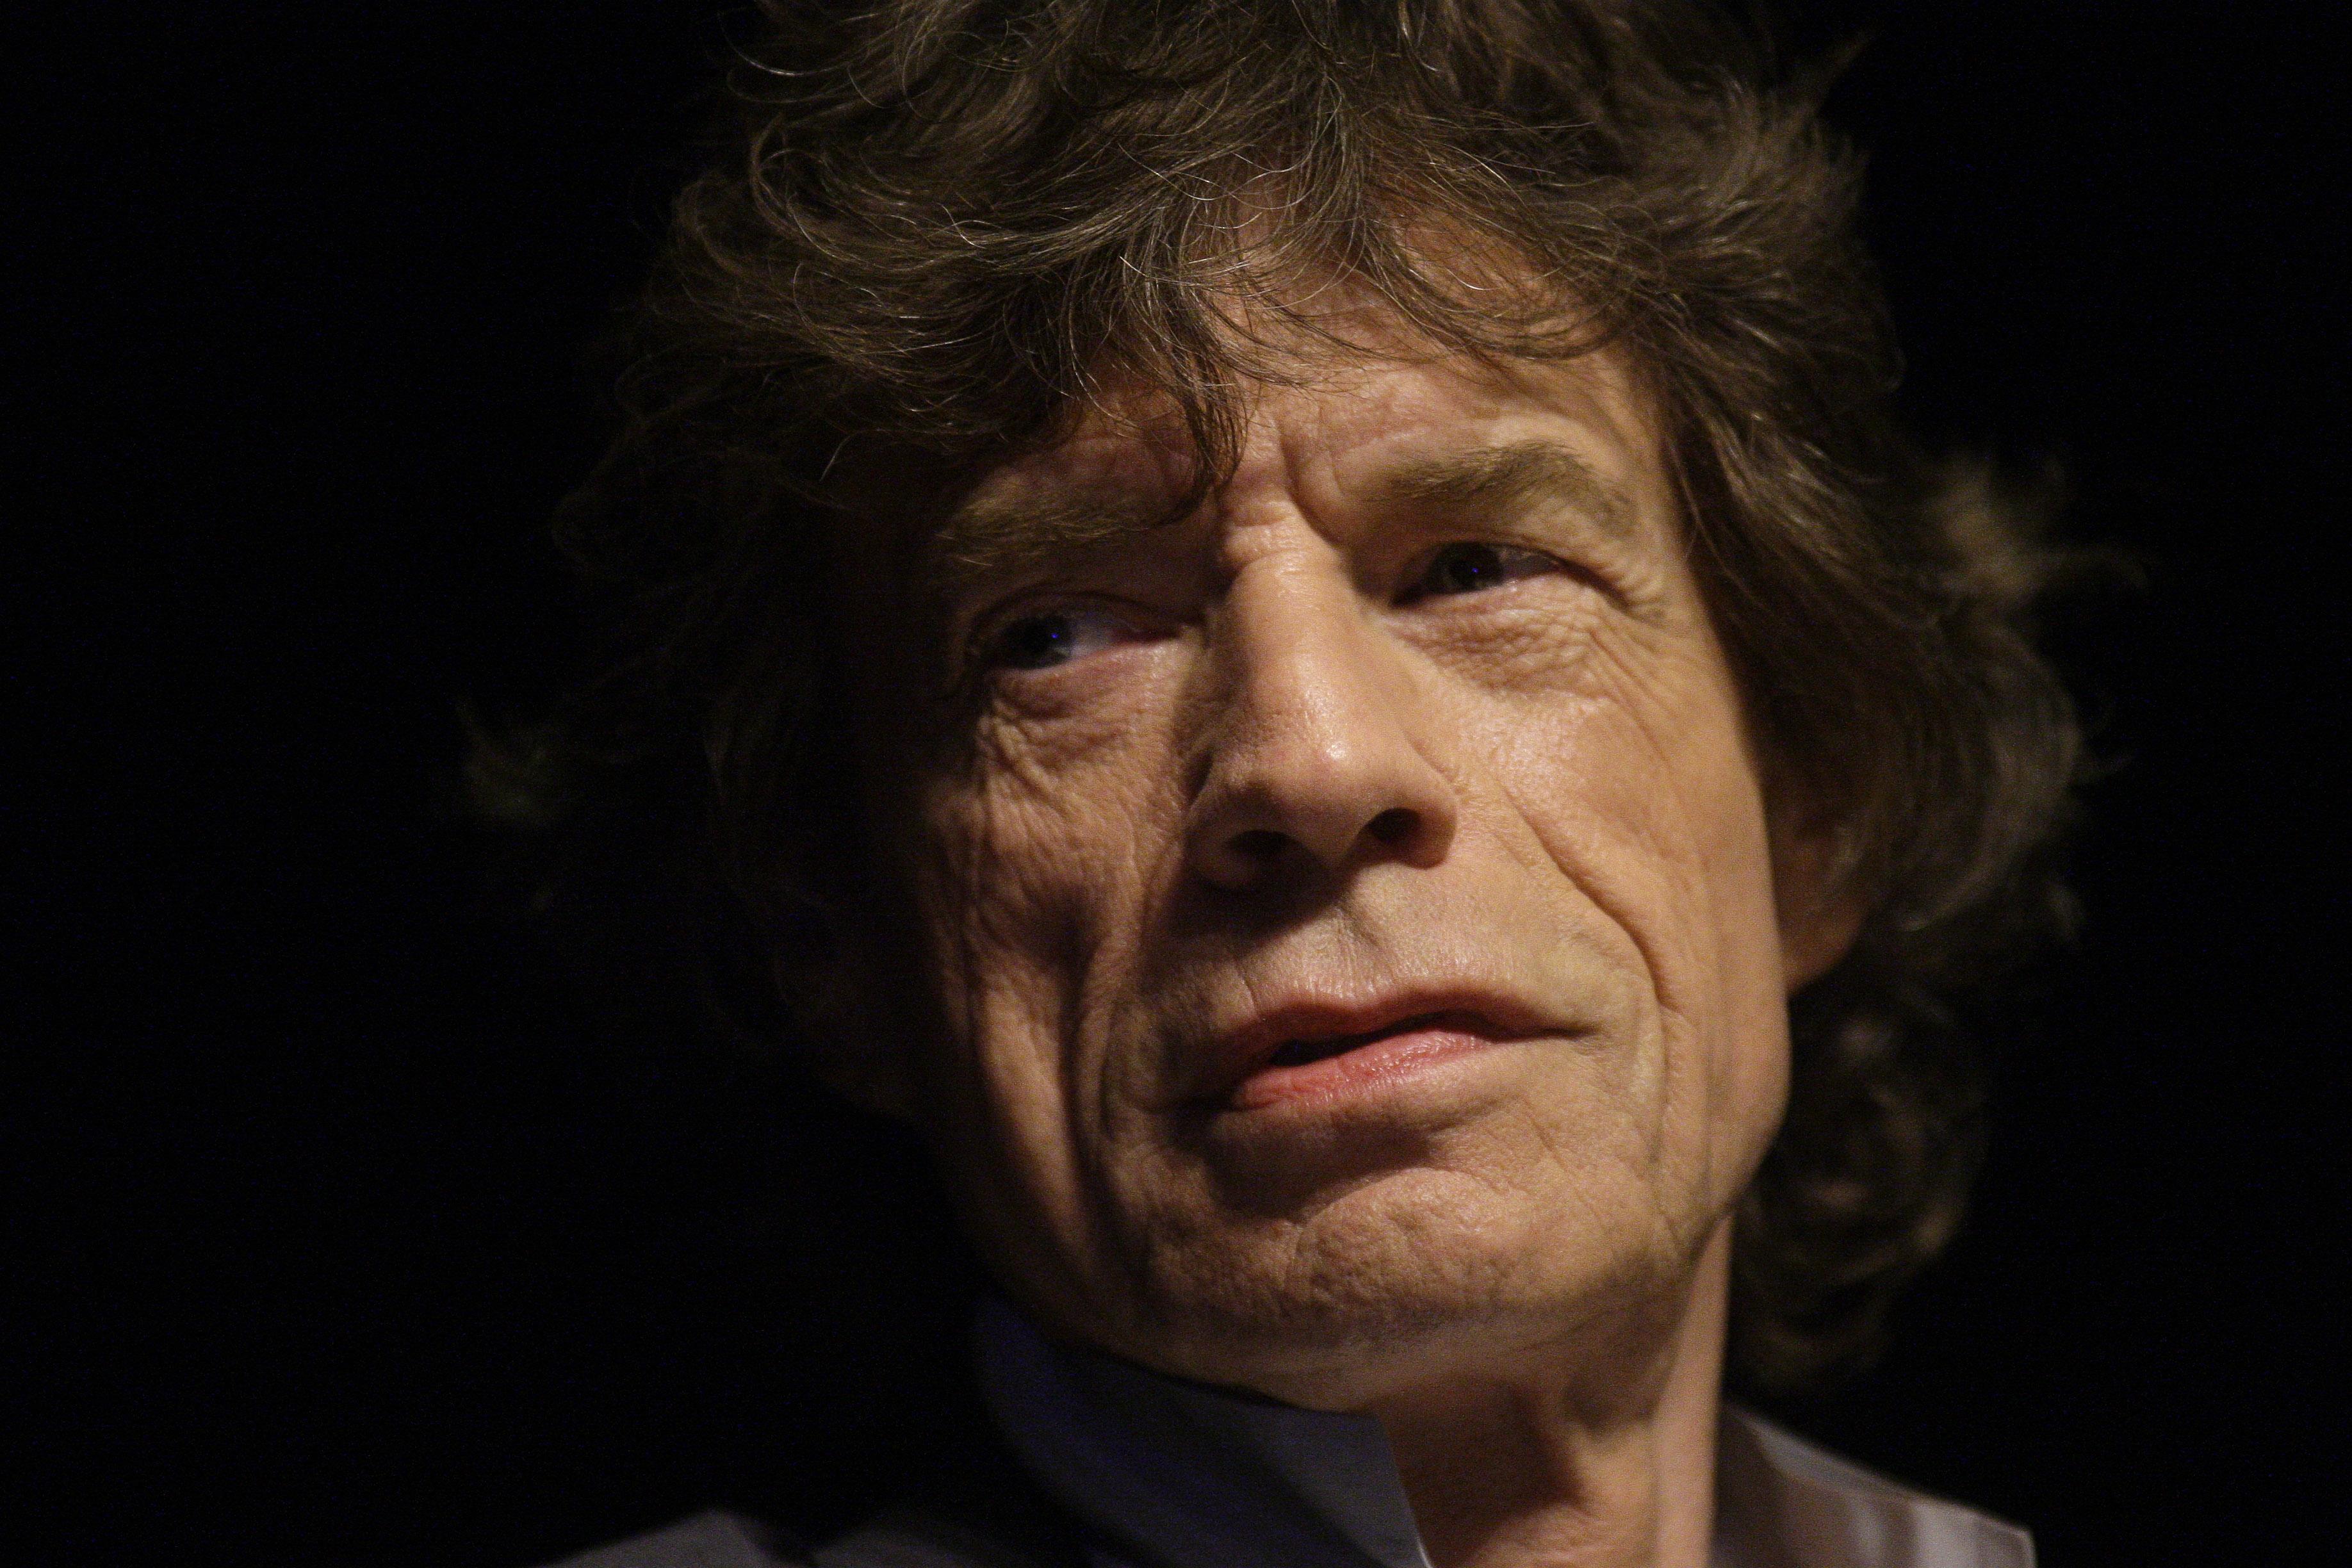 Mick jagger: im not thinking about retirement u2013 rolling stone